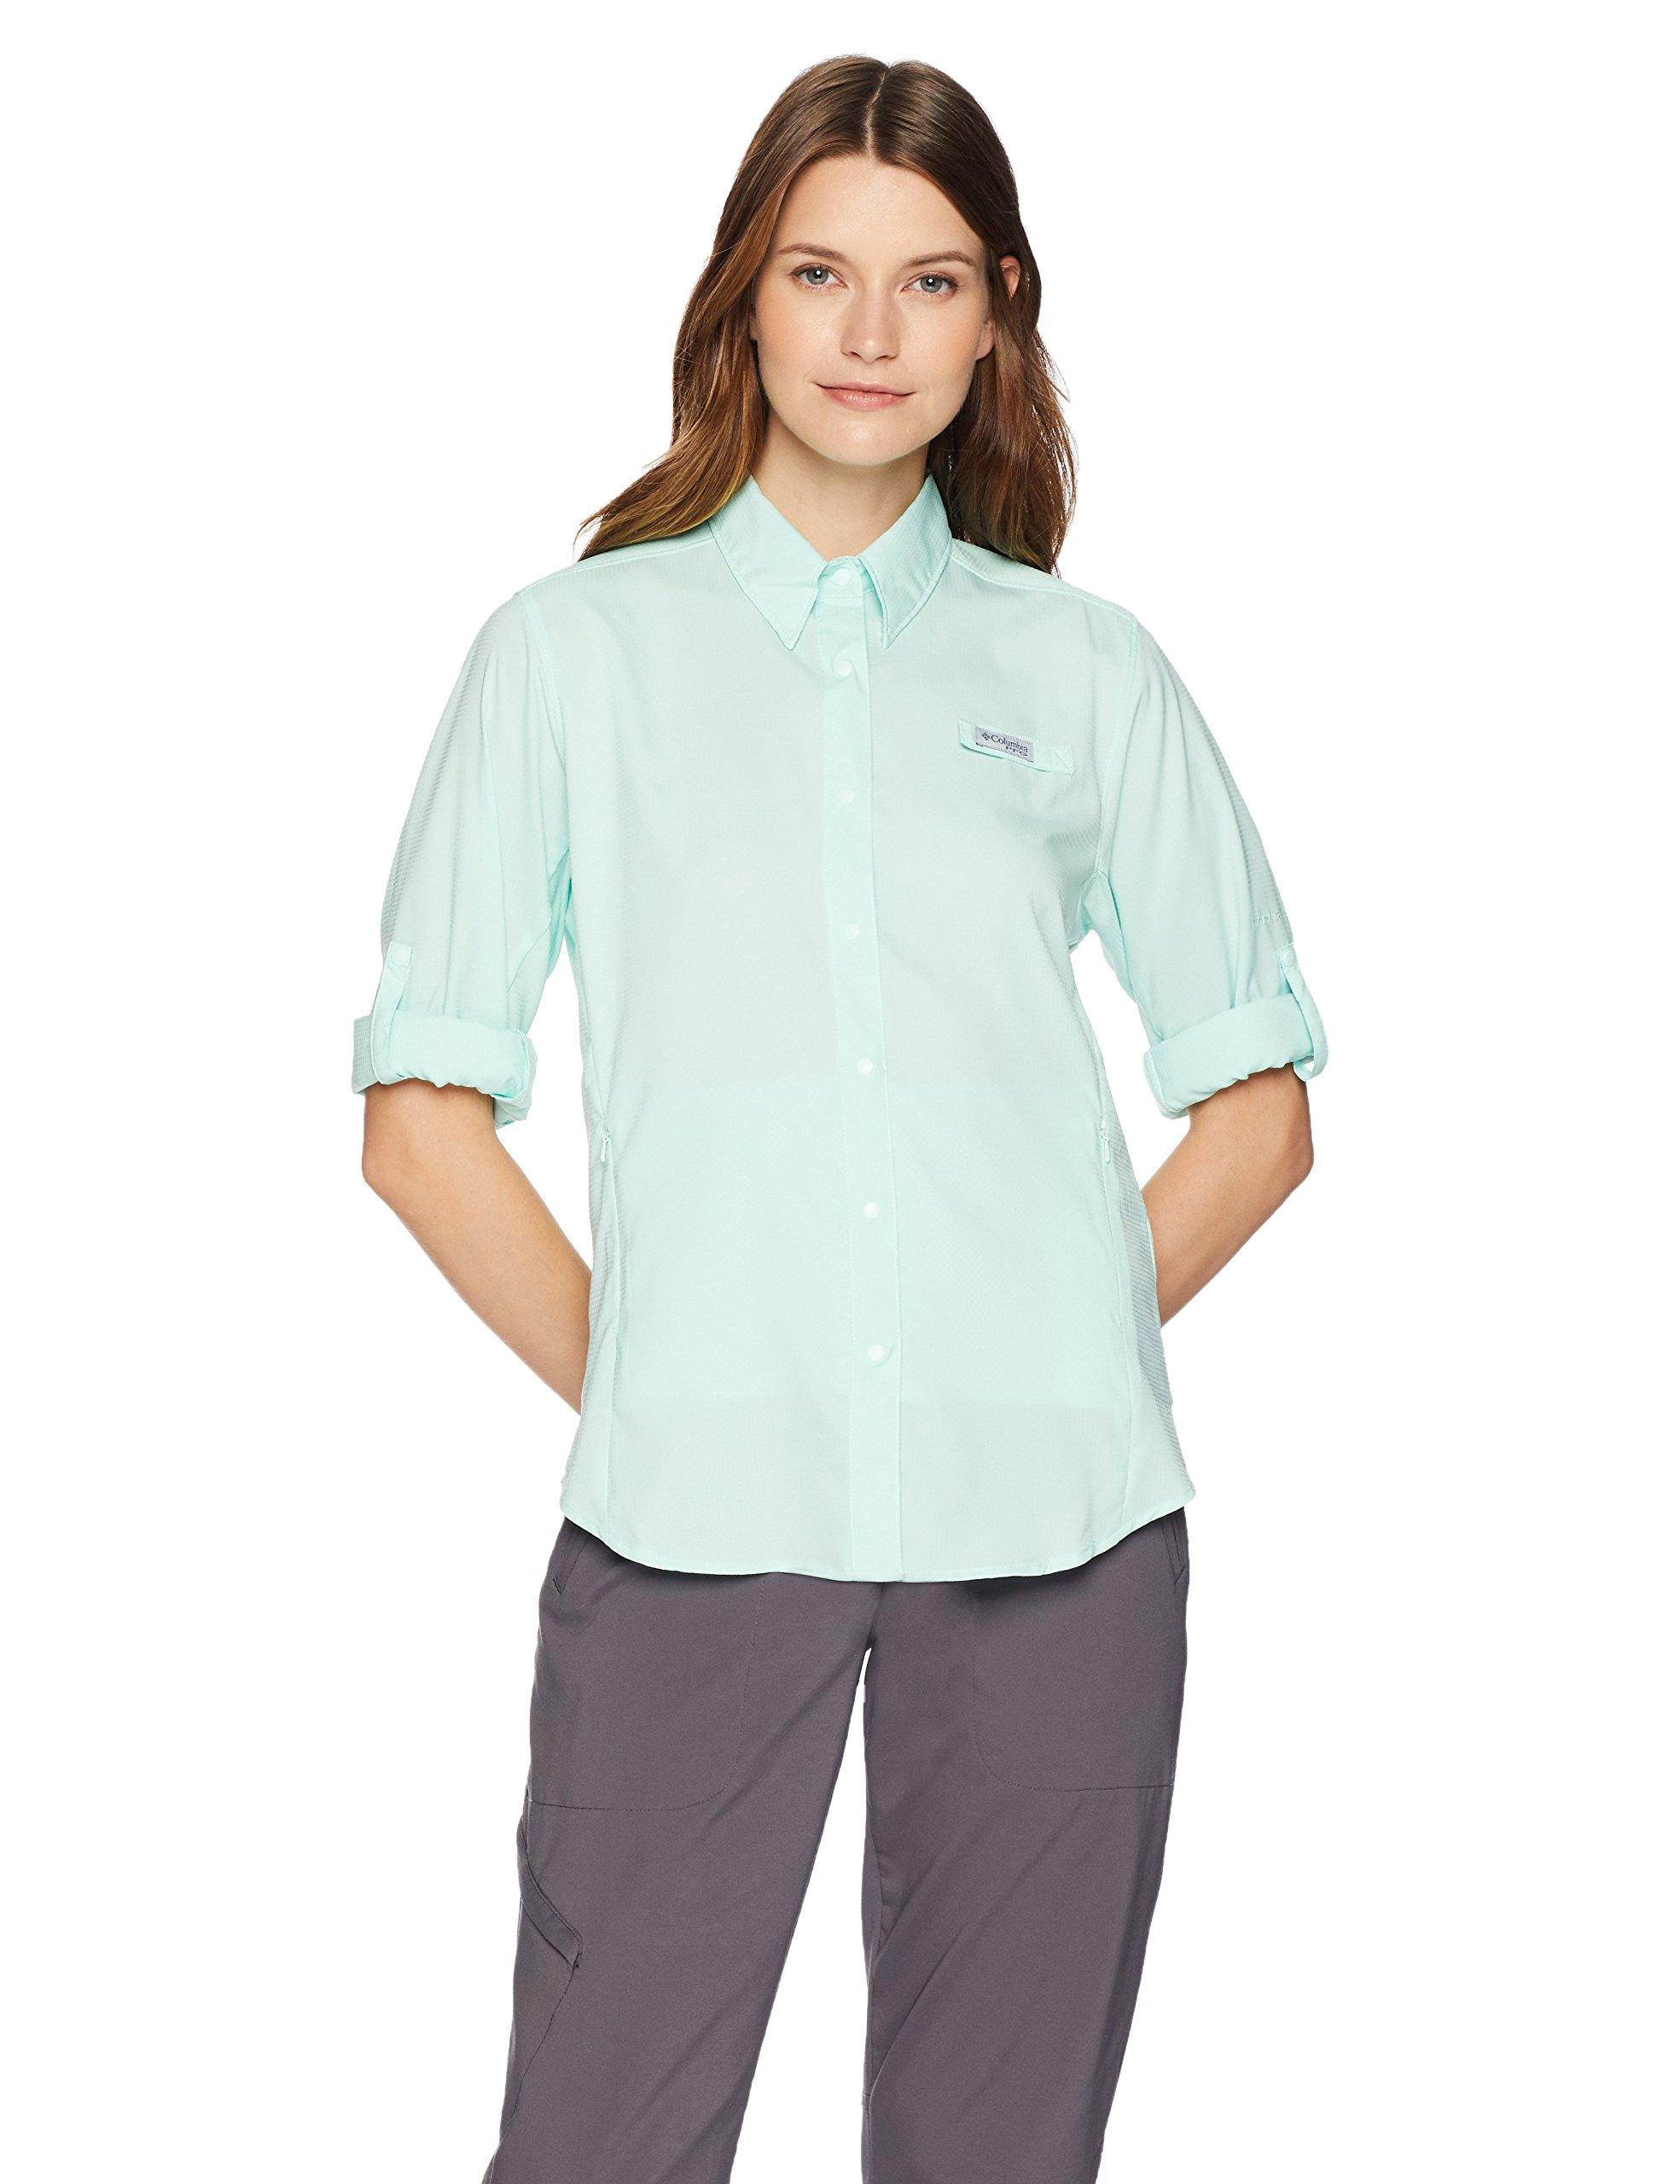 Columbia Women's PFG Tamiami II Long Sleeve Shirt , Sea Ice, X-Large by Columbia